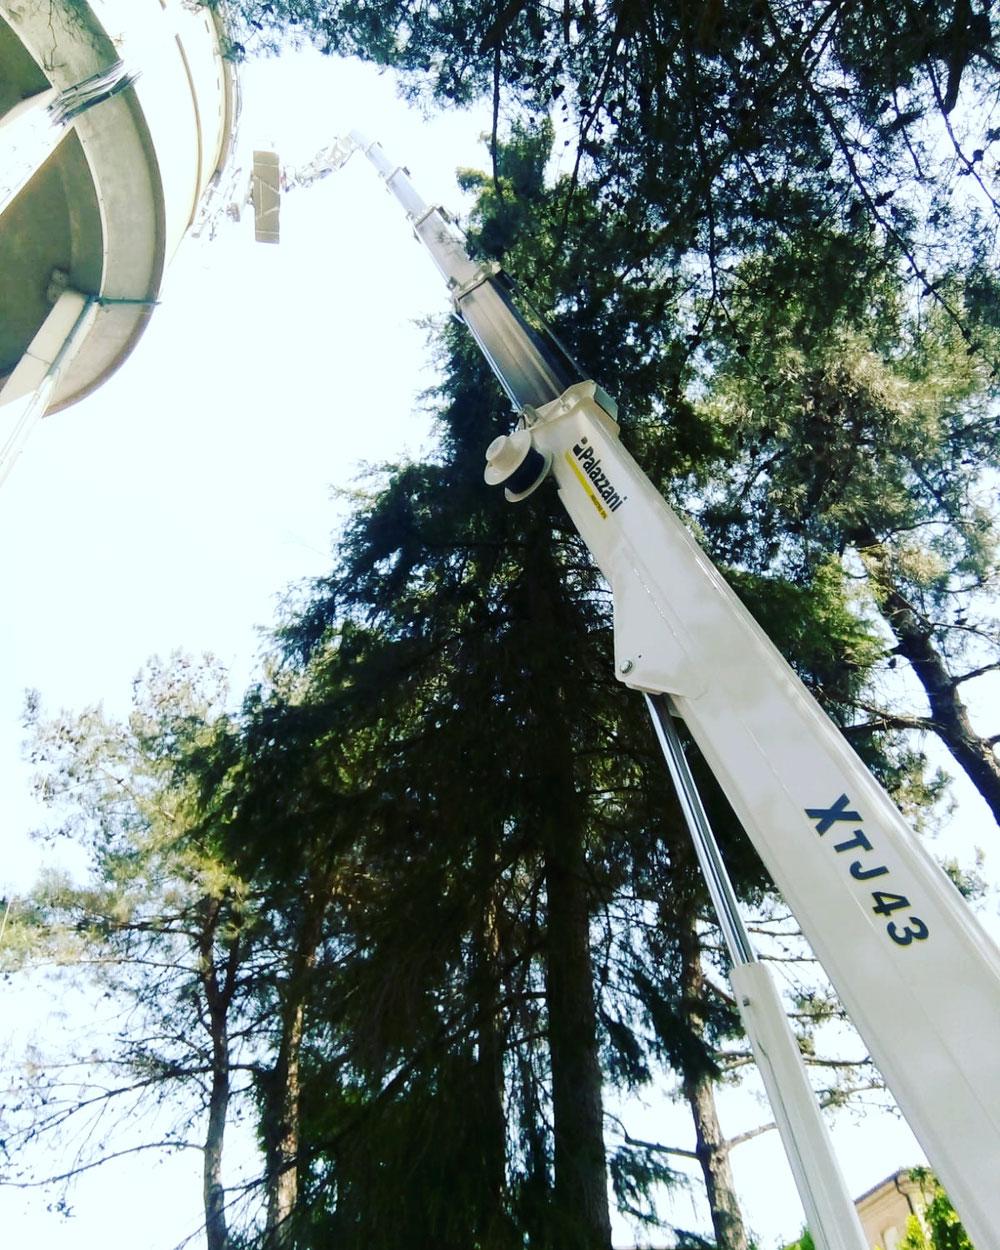 Riminigru noleggio piattaforma aerea ragno cingolata per telefonia a Cervia Ravenna